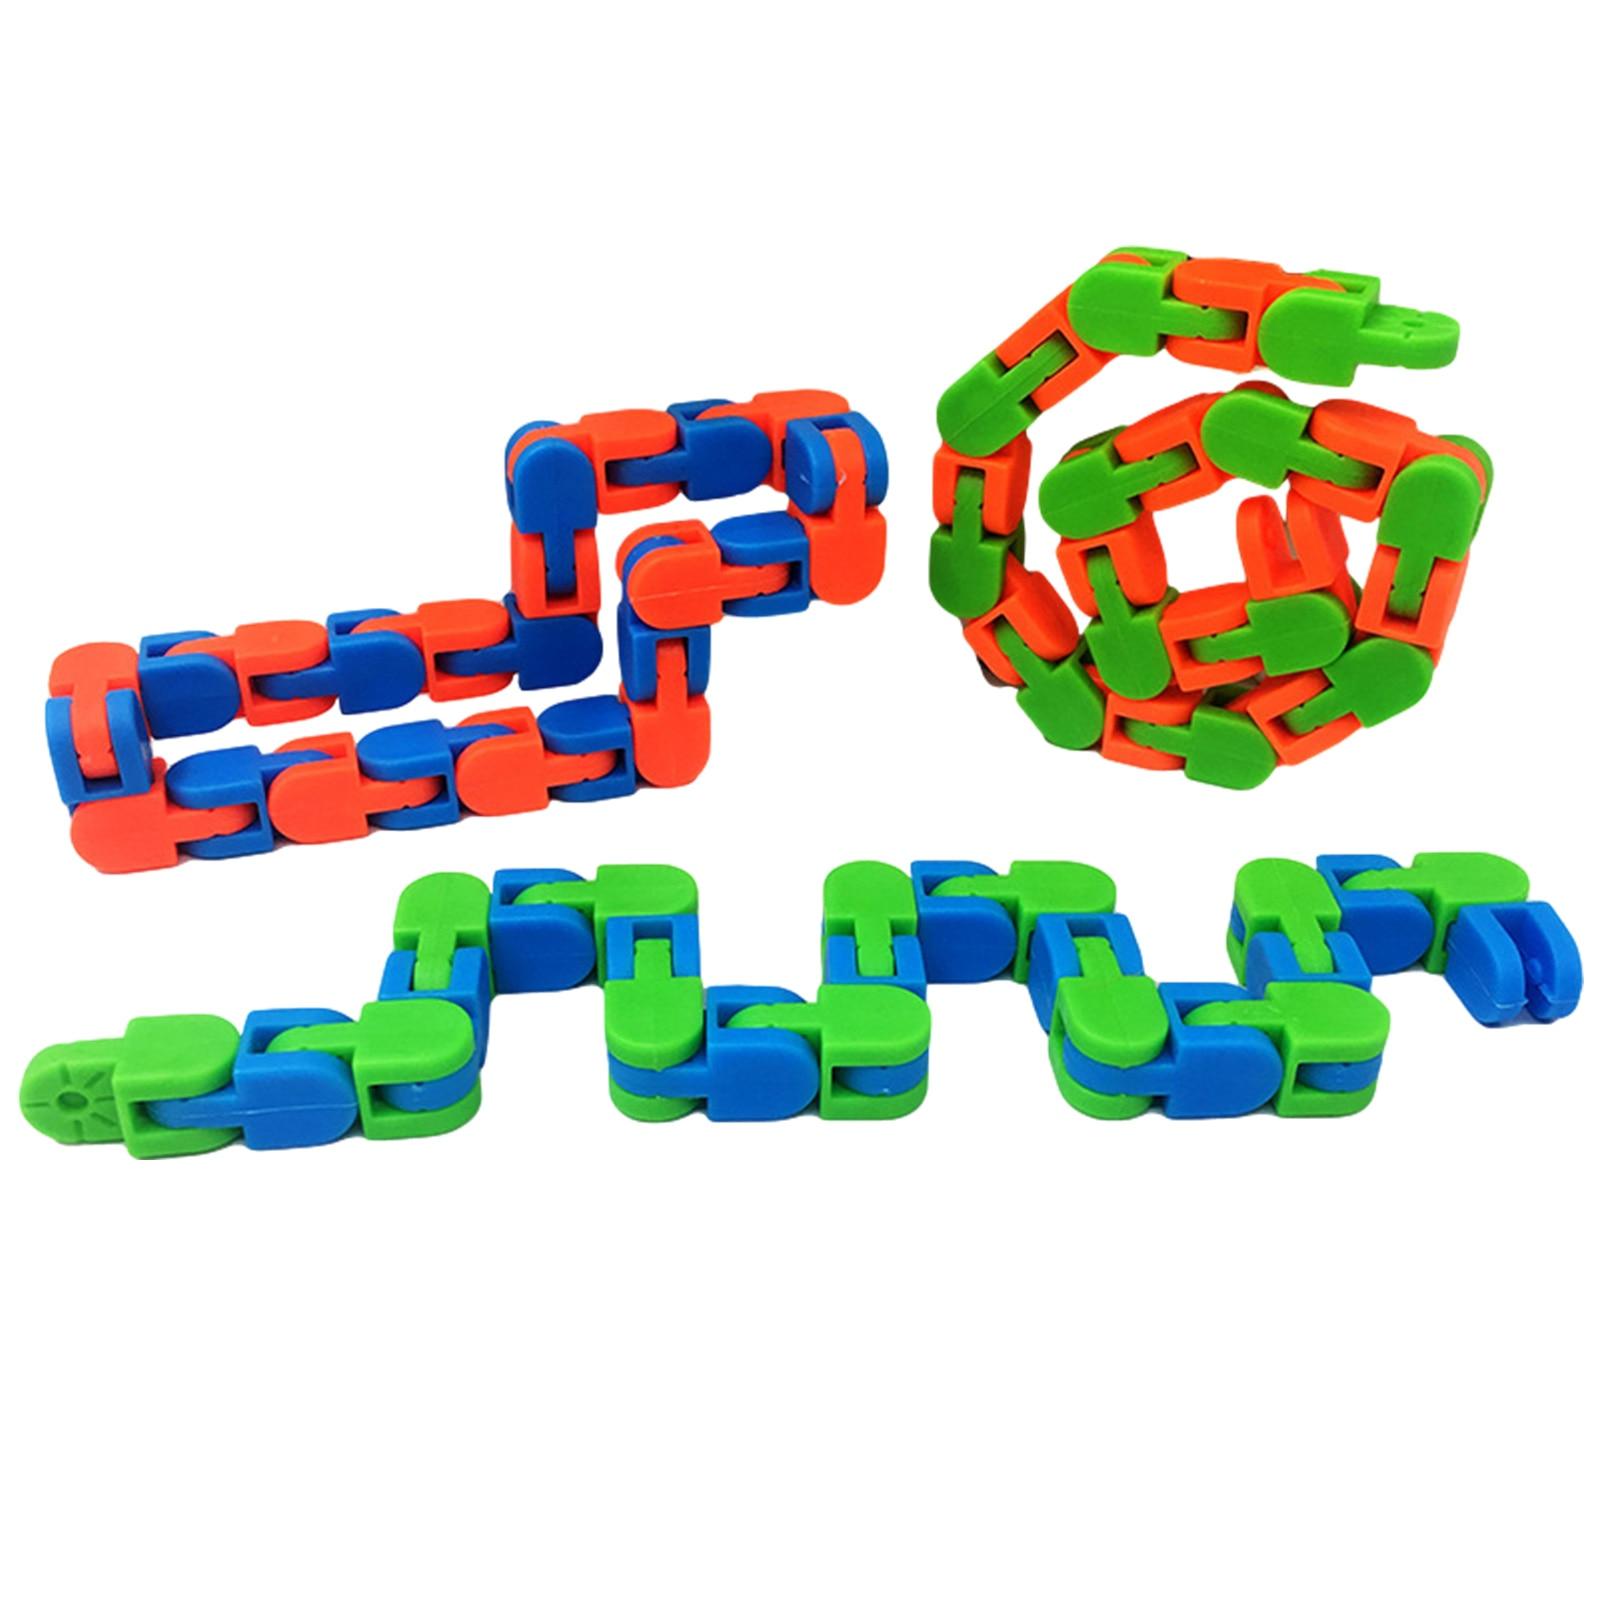 Children Funny Fidget Fiddle Sensory Toy Wacky Tracks Stress Relief Educatiaon Block valuable